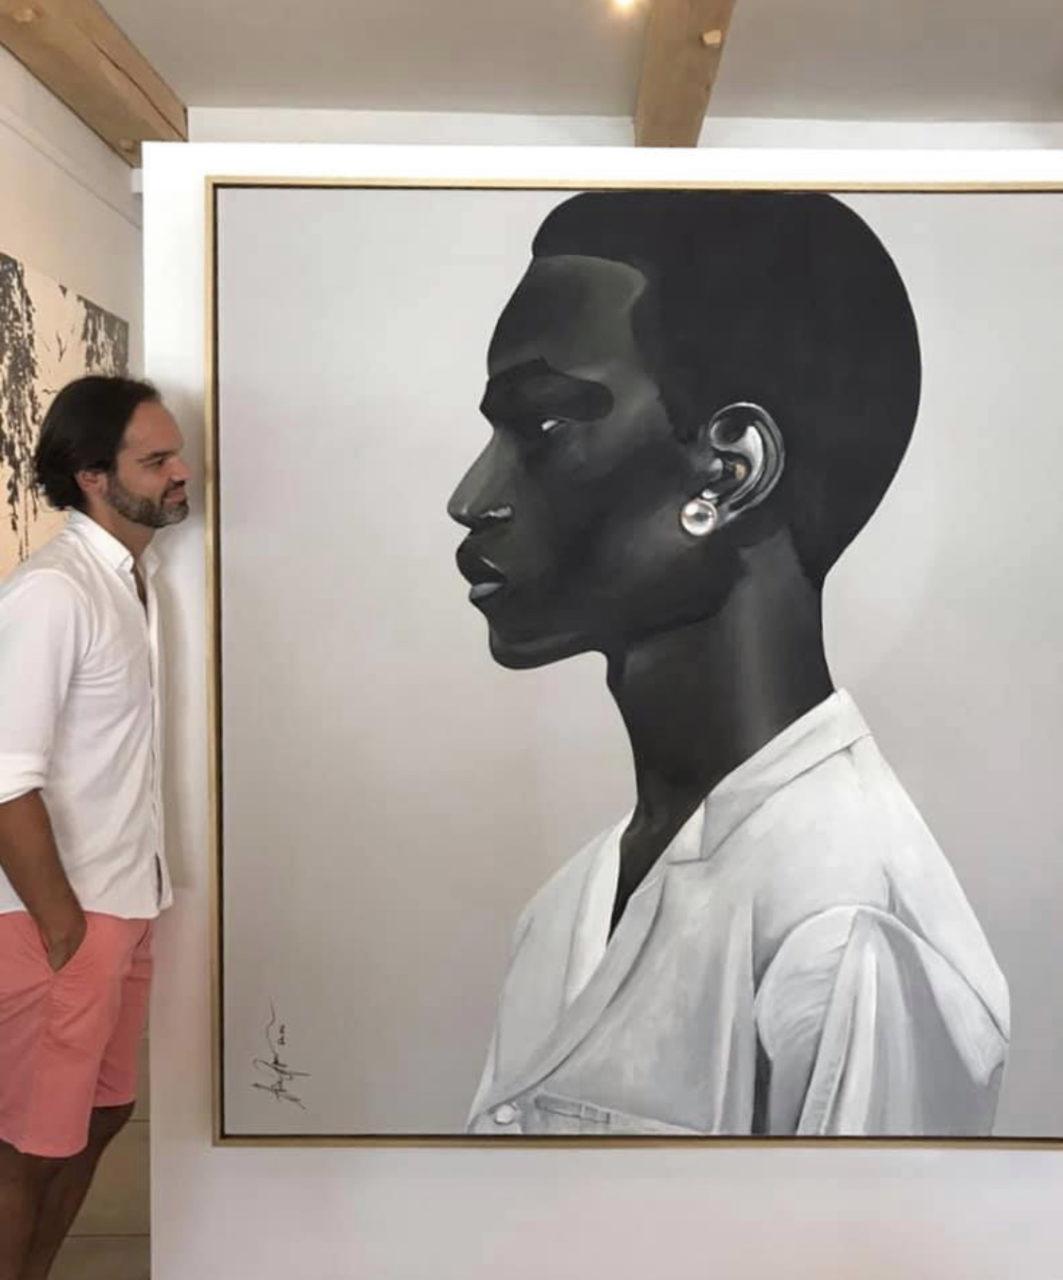 Abe Opperman gallery